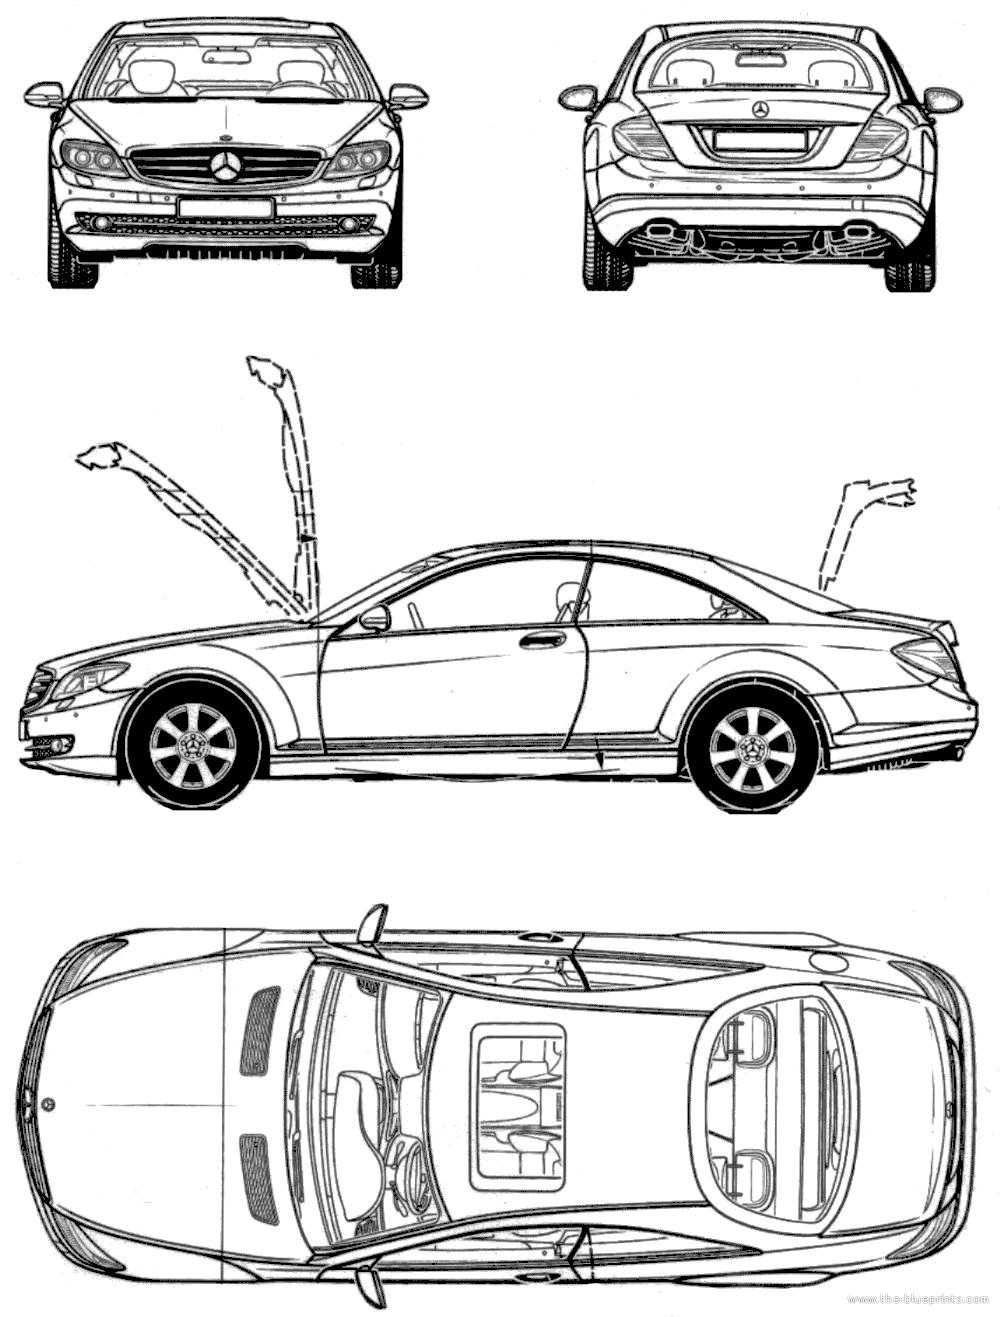 Blueprints > Cars > Mercedes-Benz > Mercedes-Benz SLK 230